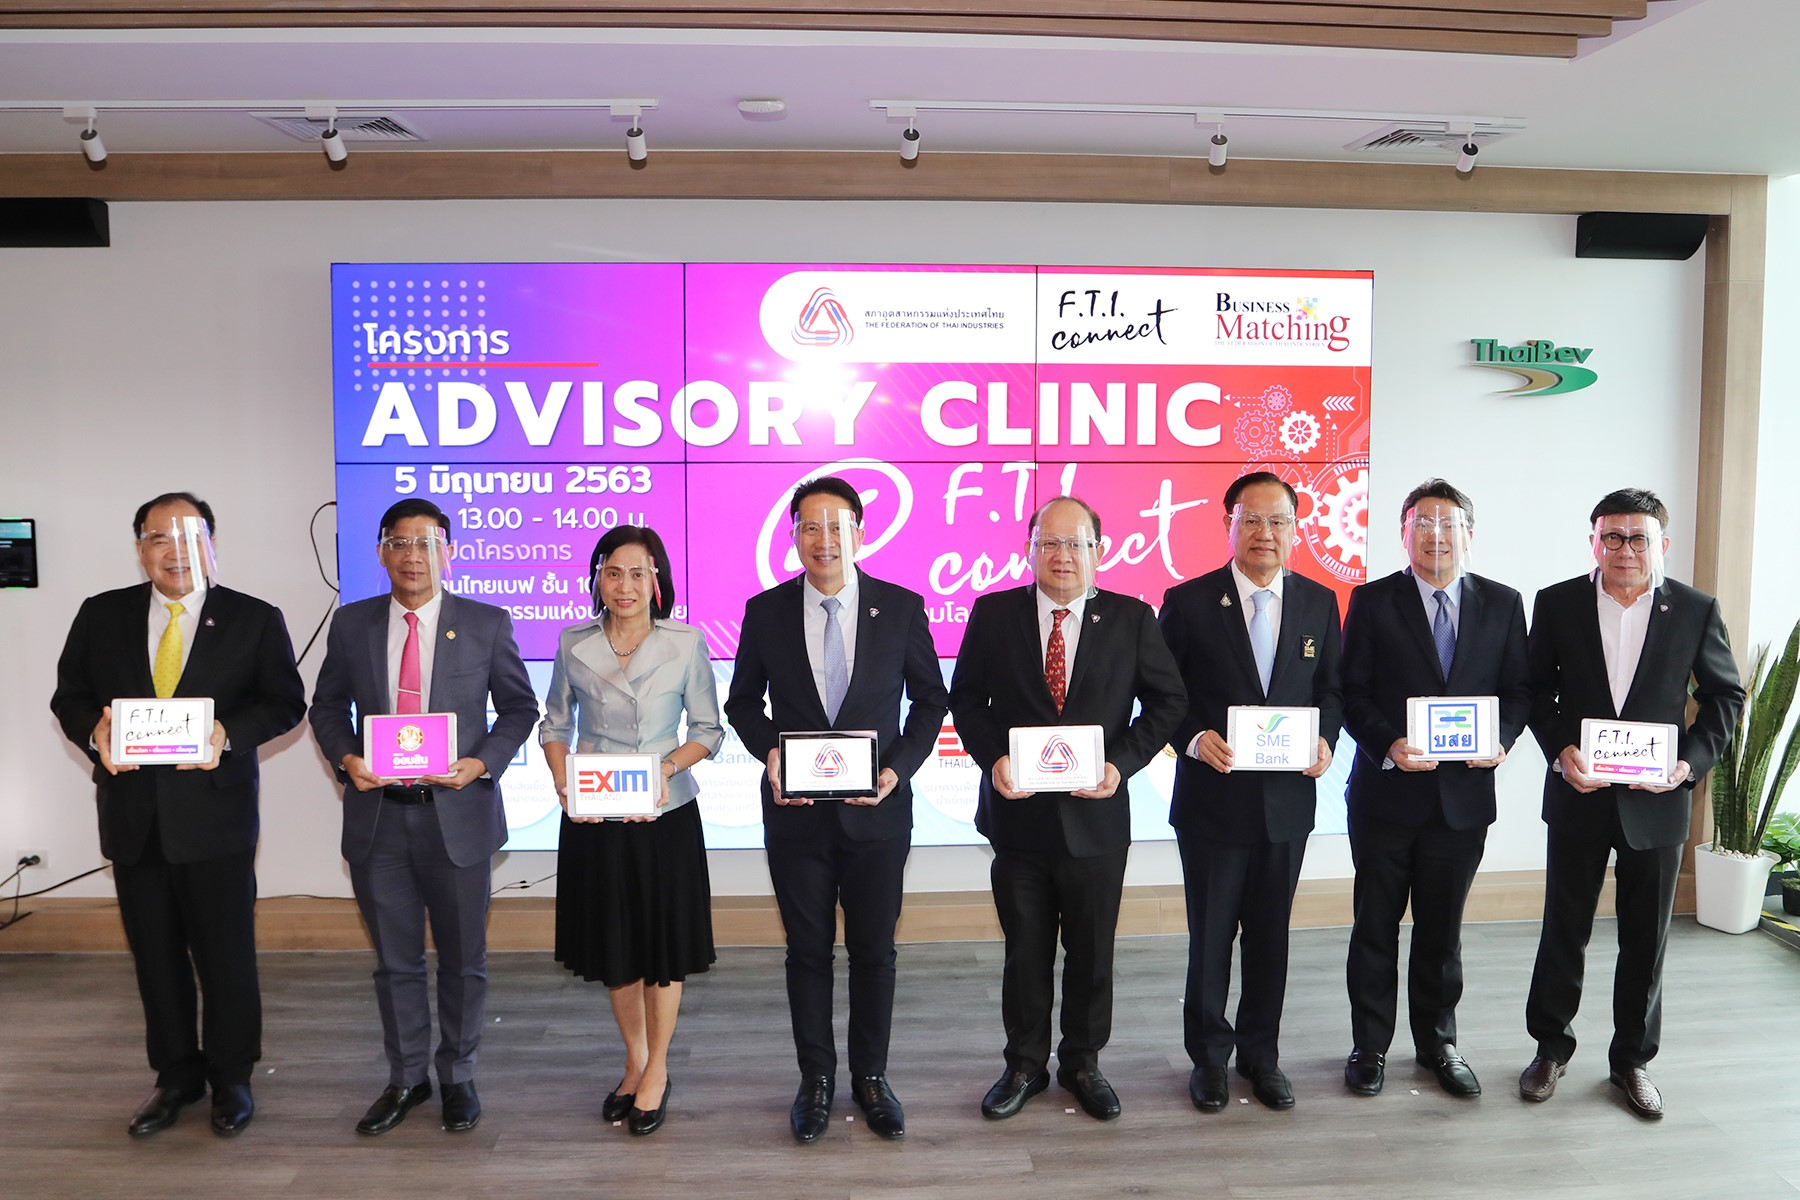 Advisory Clinic @ F.T.I. Connect